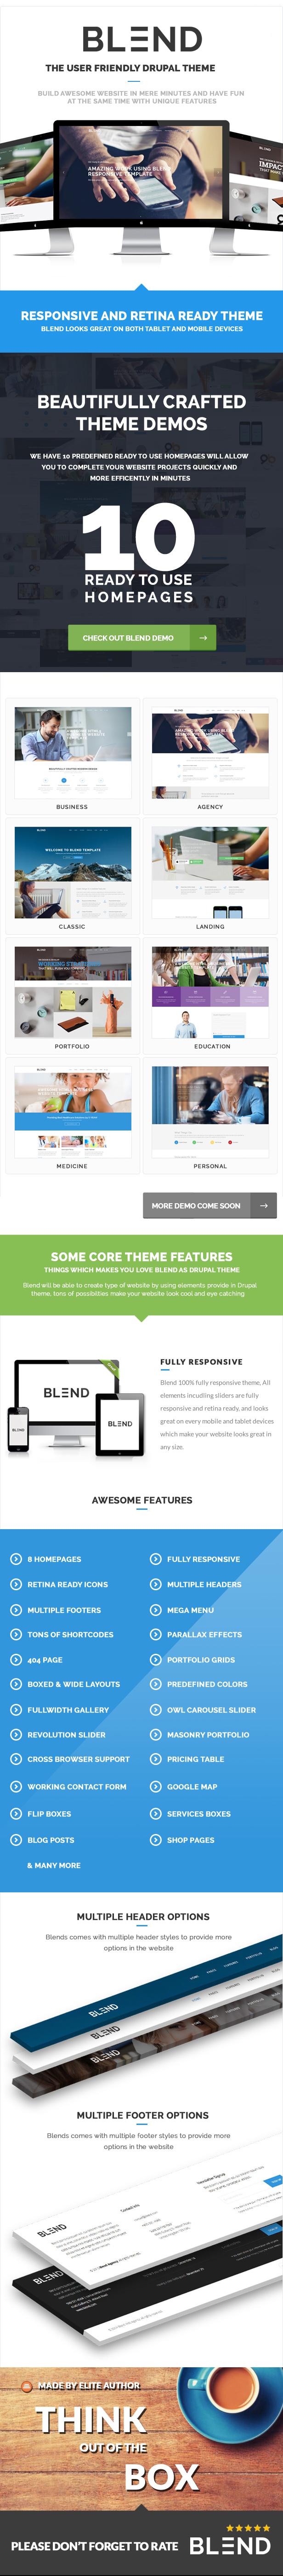 Blend - Multi-Purpose Responsive Drupal 8 Theme - themeforest, drupal, cms-themes